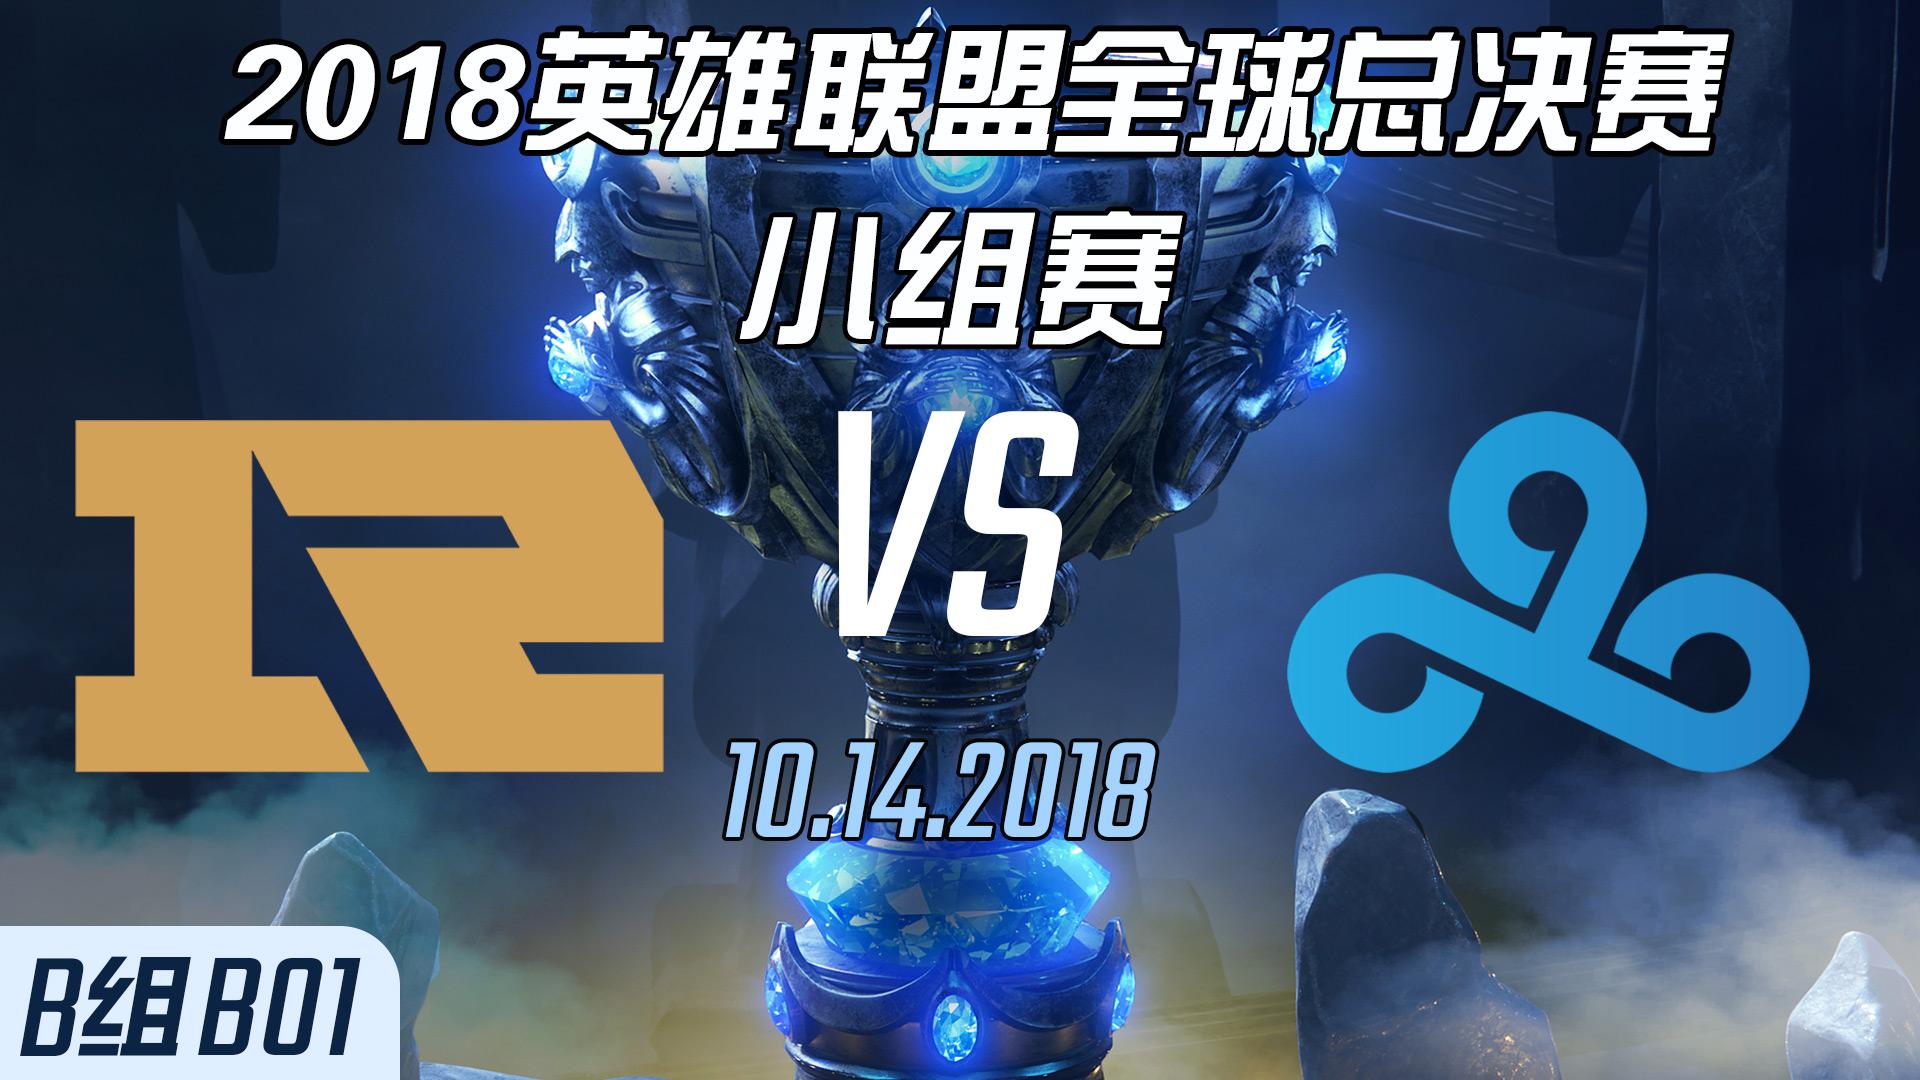 RNG鏖战C9绝地求生 拿下小组第一